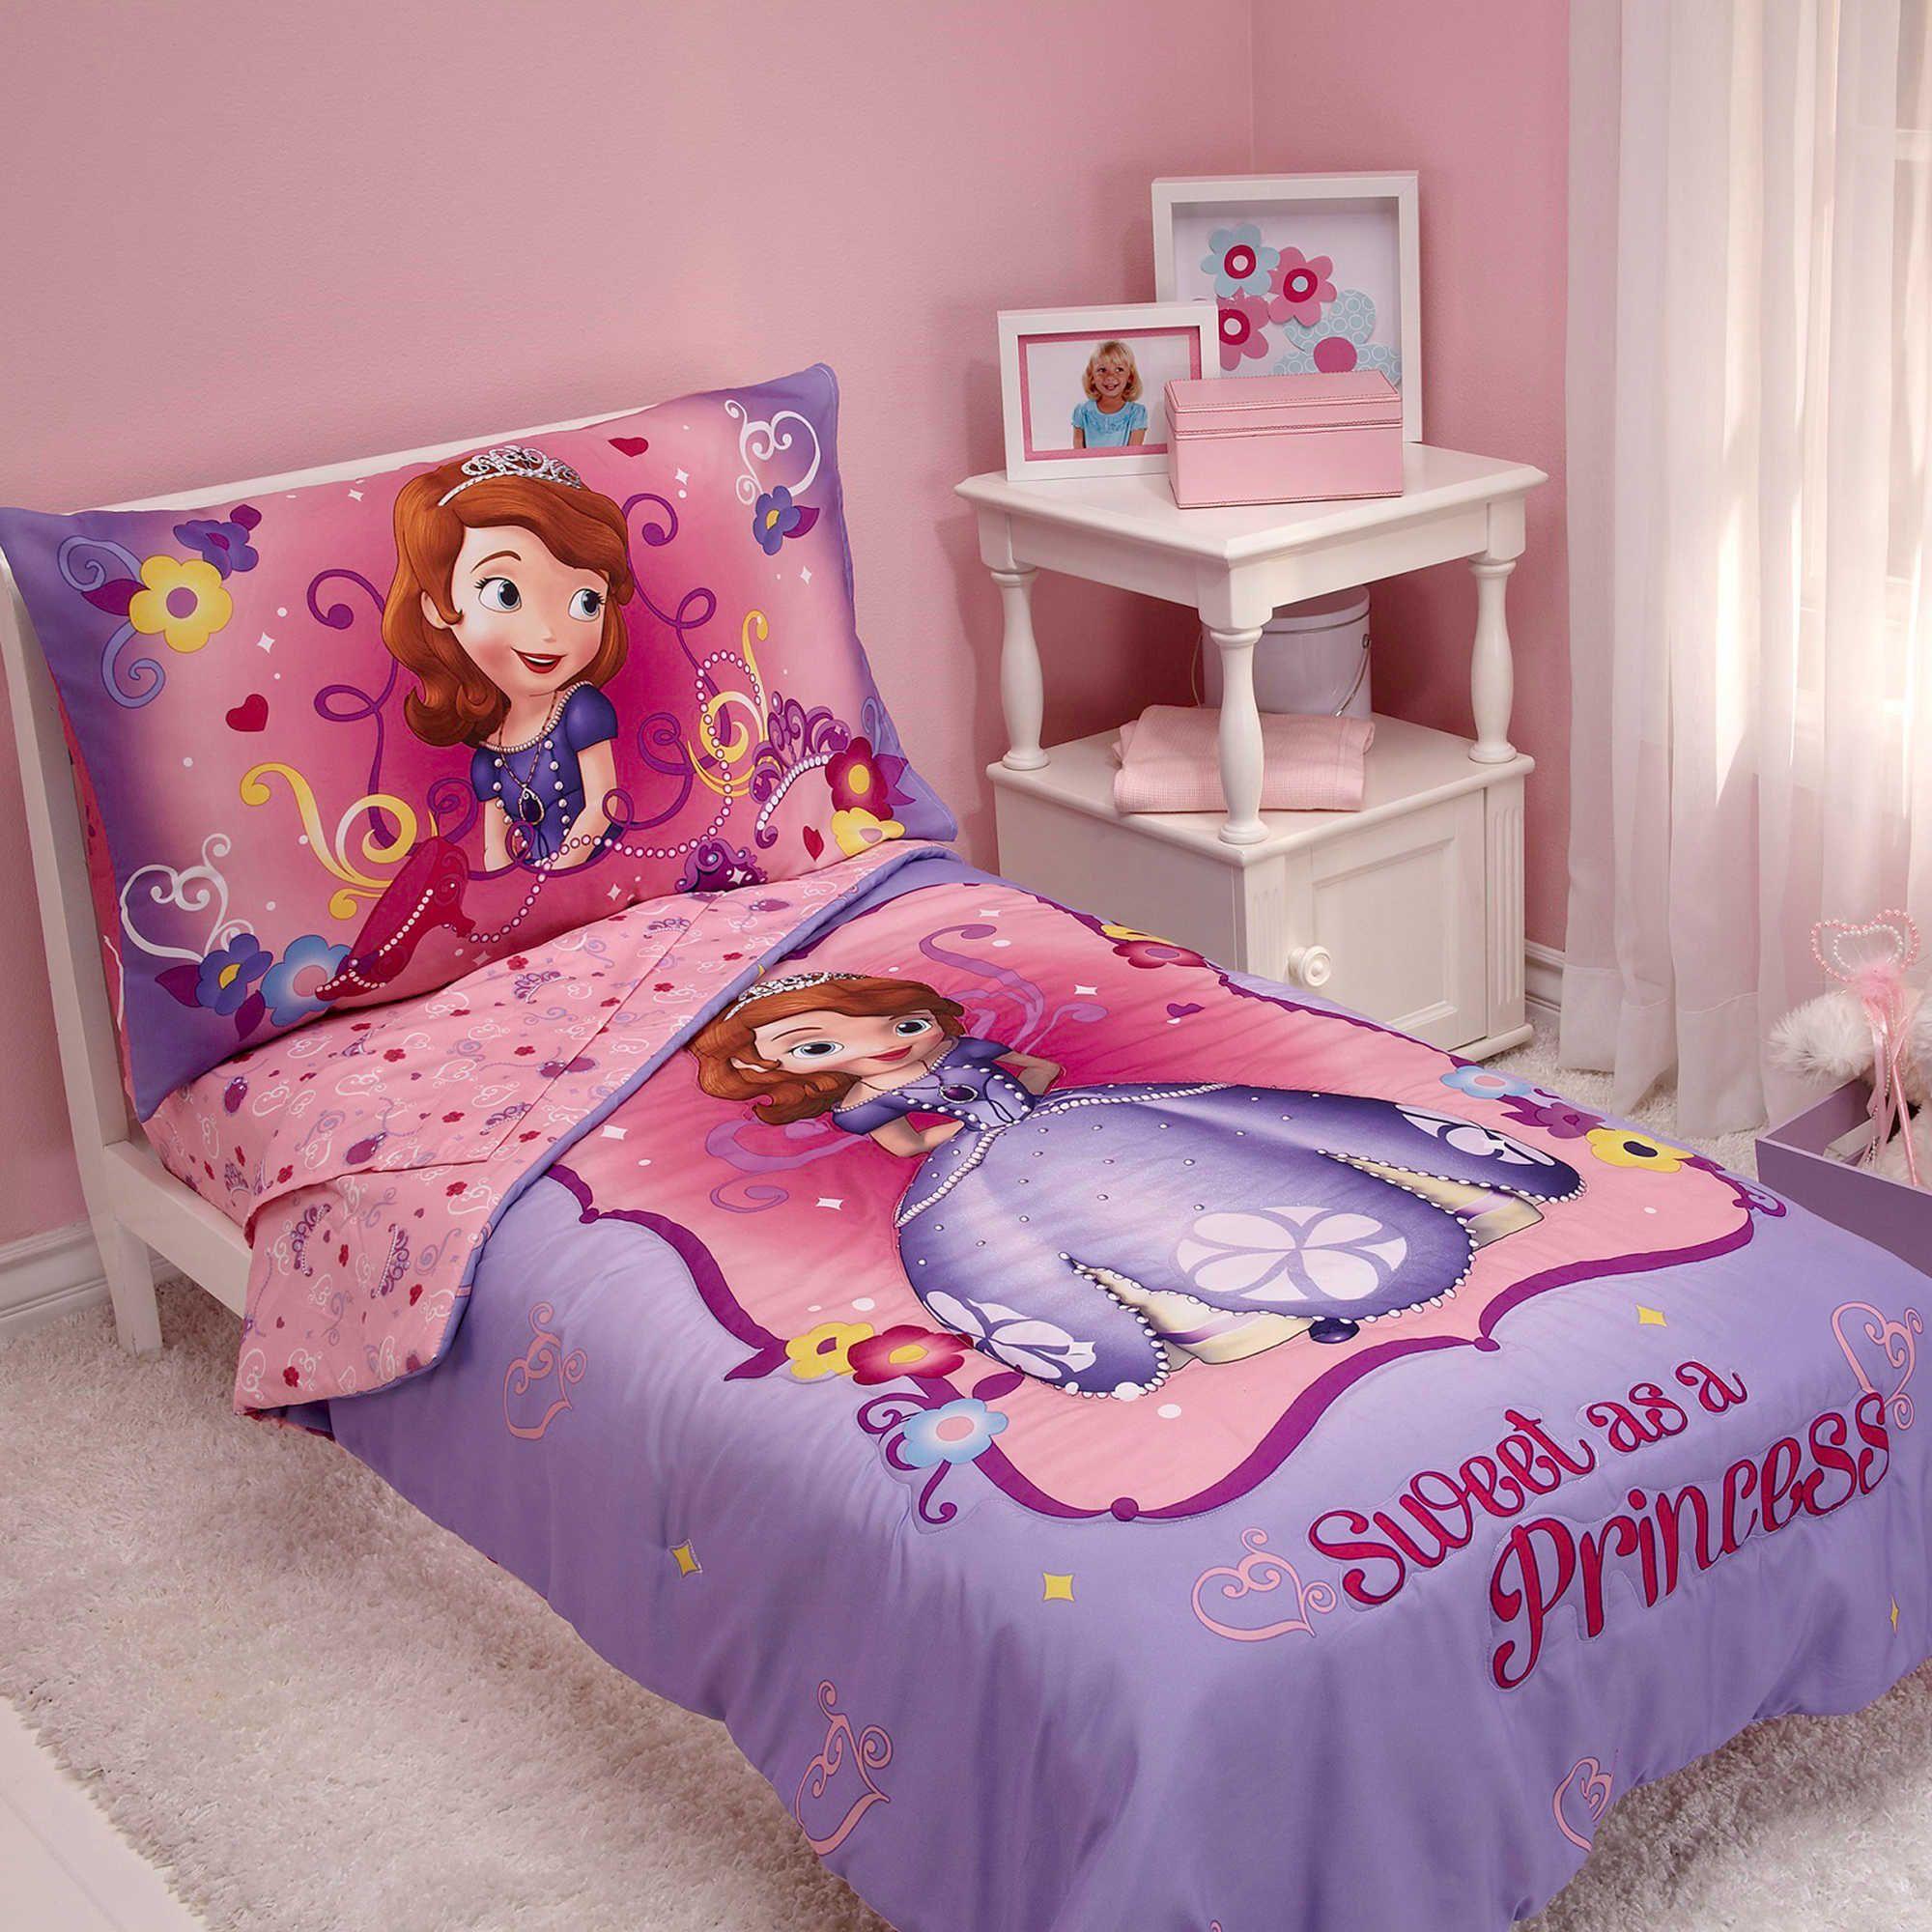 Artwork Of Fun Bed Sheets Ideas Decoracao De Quarto De Princesa Decoracao De Quarto Quarto De Princesa